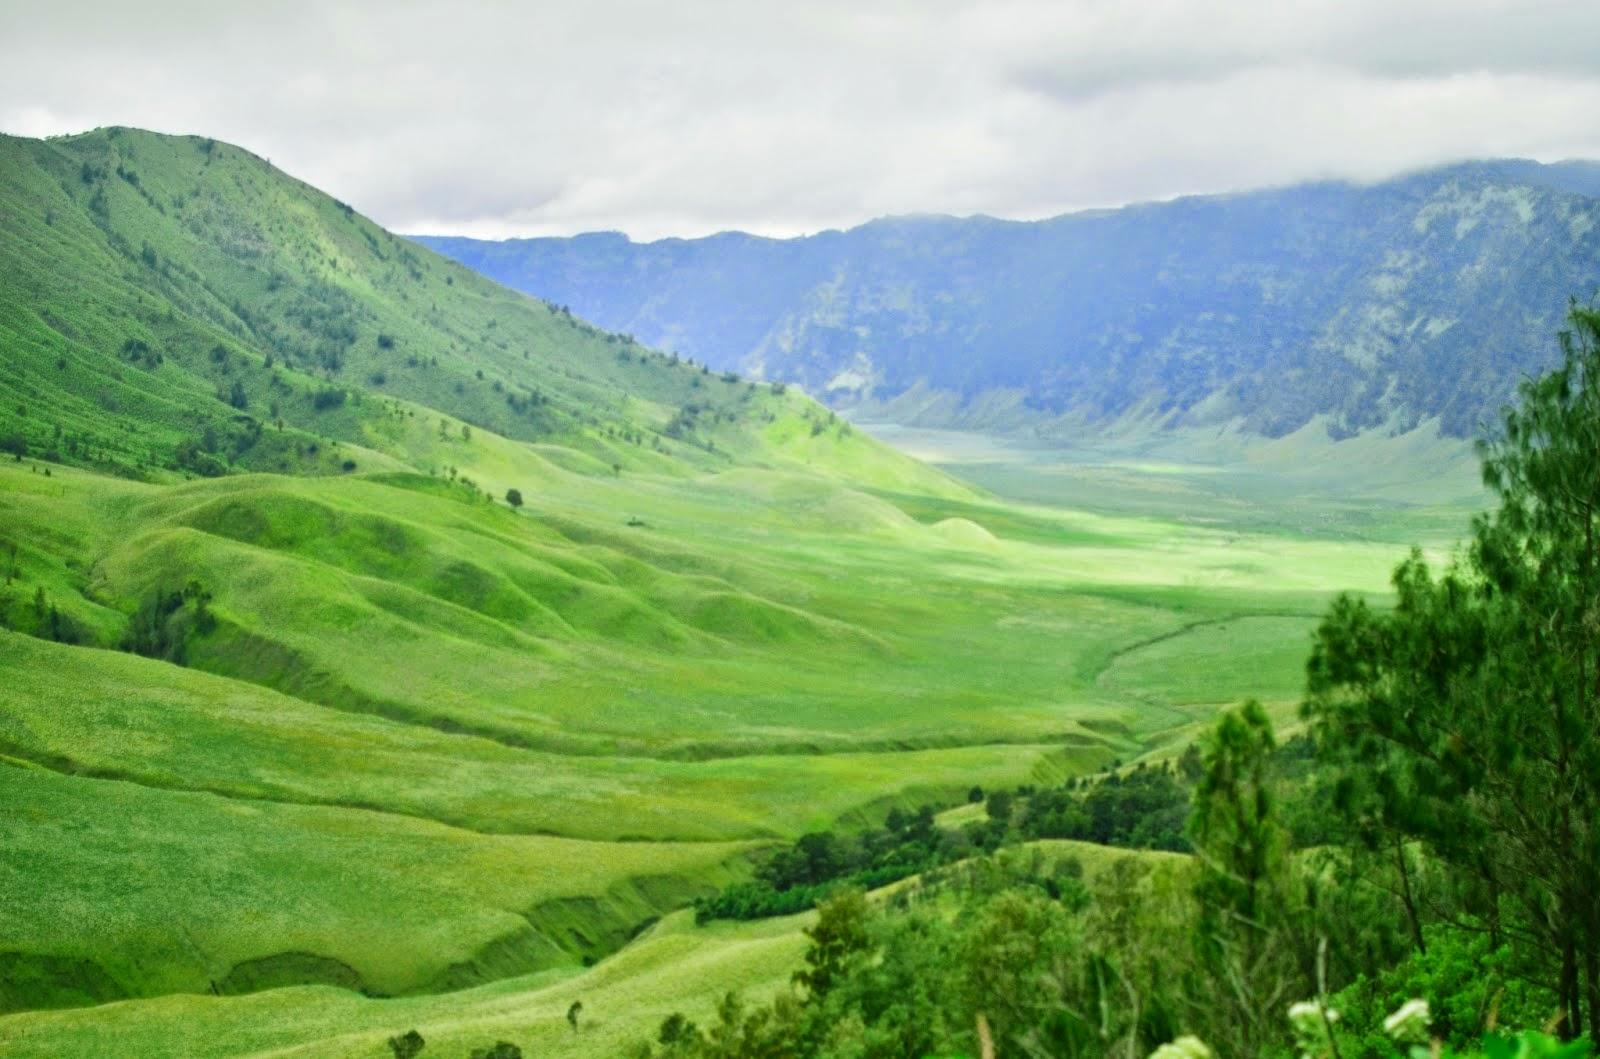 Padang Savana